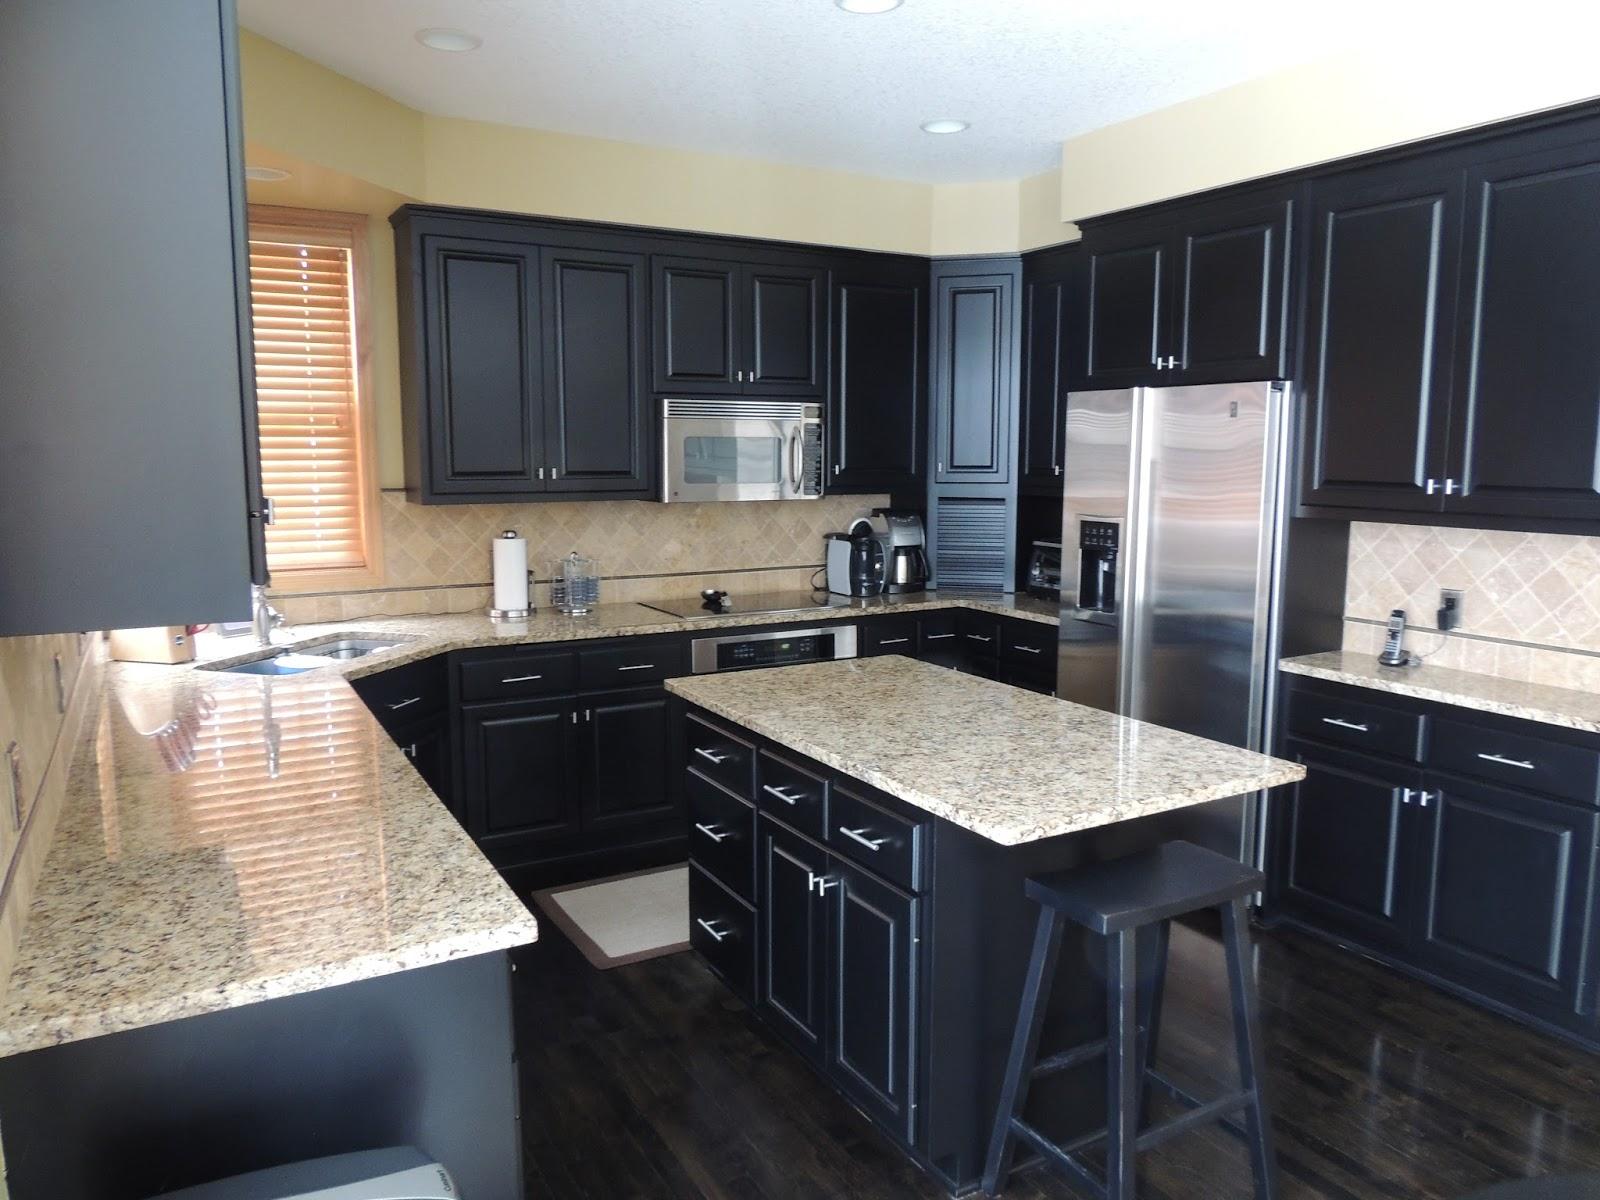 Contoh-motif-lantai-untuk-ruang-dapur-menggunakan-bahan-beton